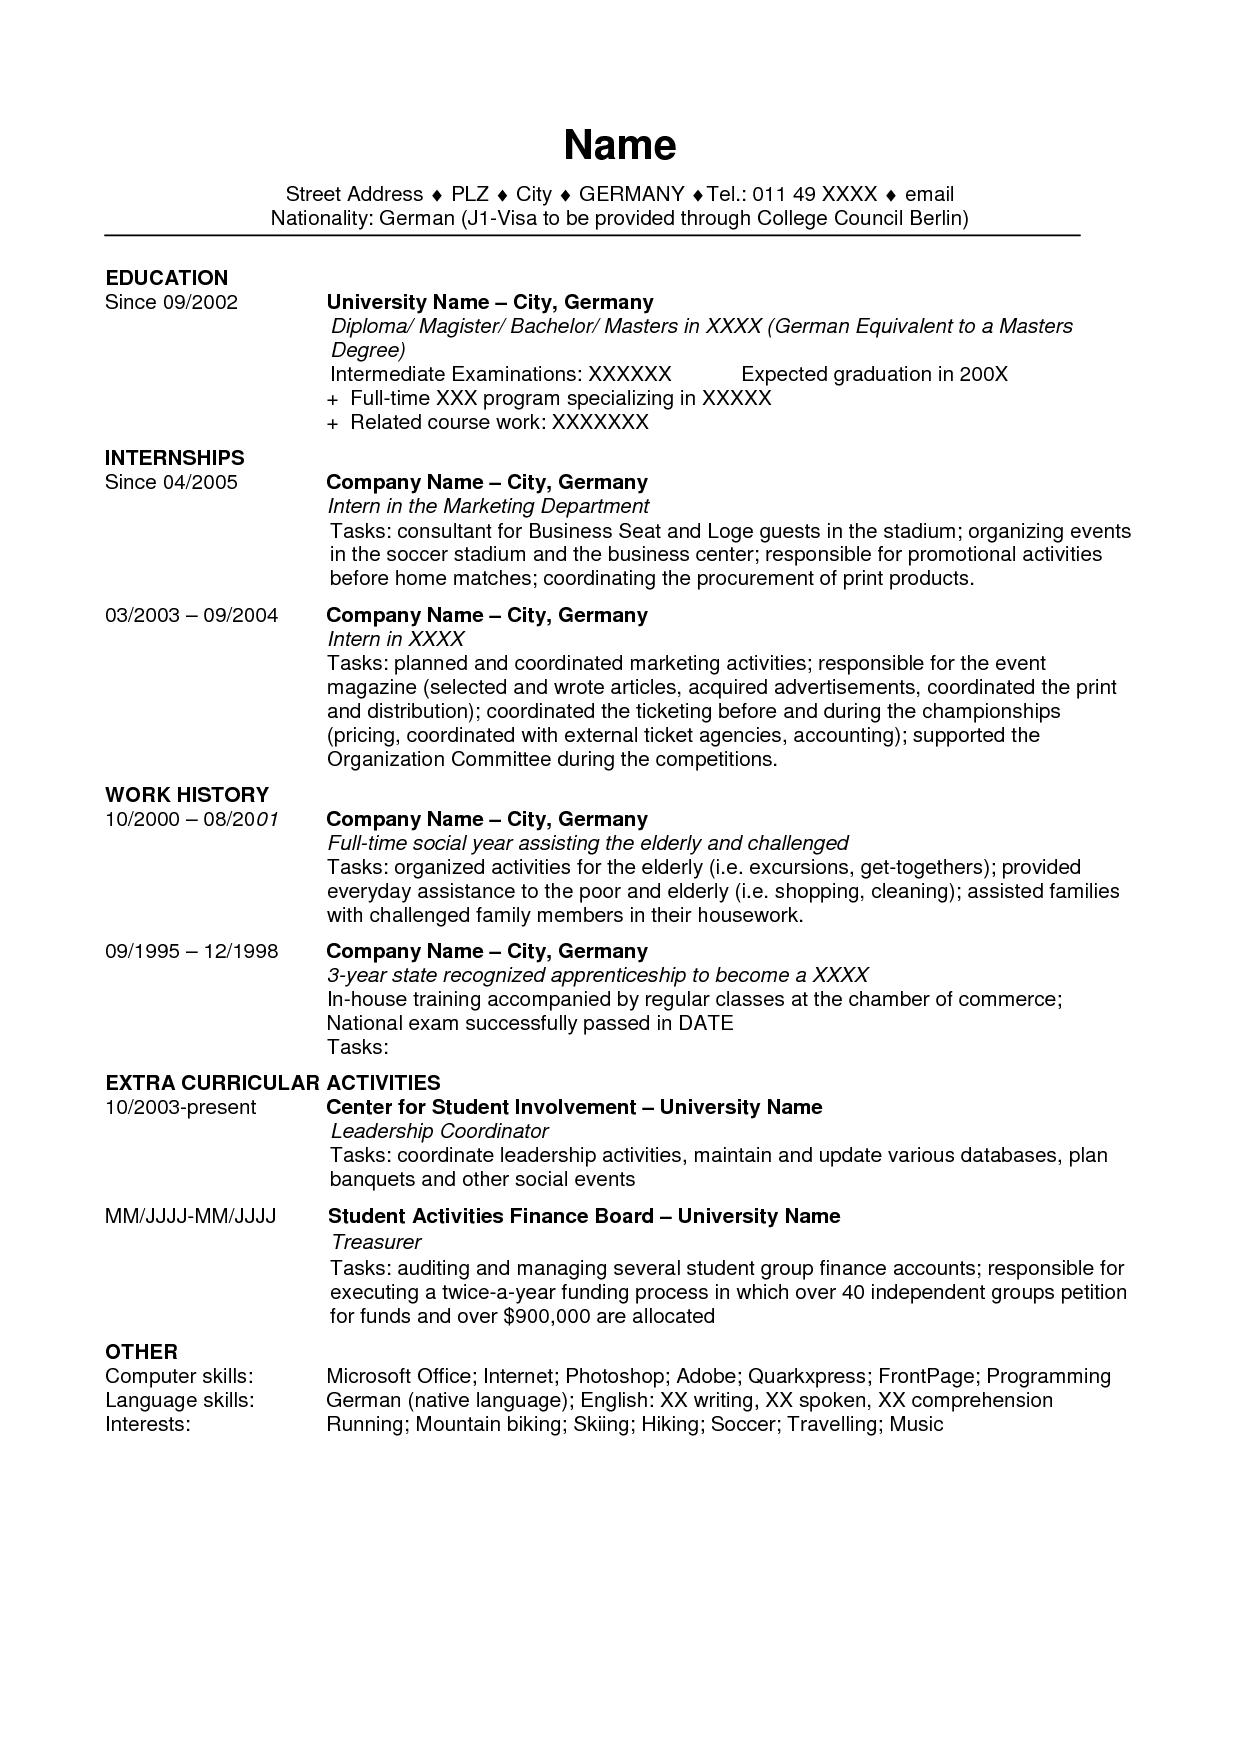 resume template usa  Usa - resume template usa